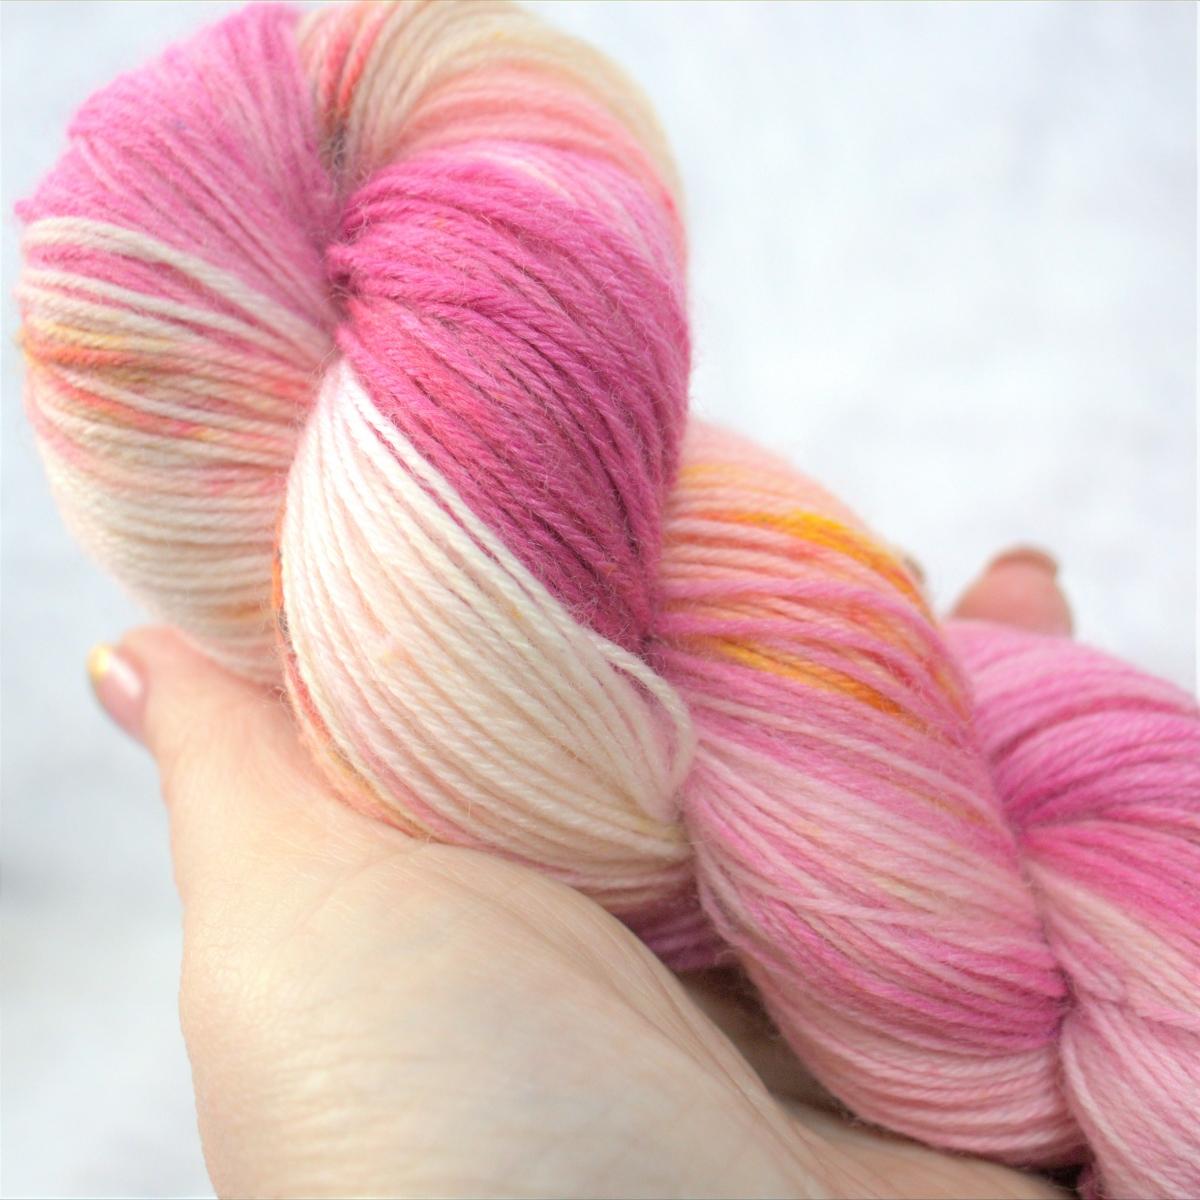 woodico.pro hand dyed yarn 053 1 1200x1200 - Hand dyed yarn / 053